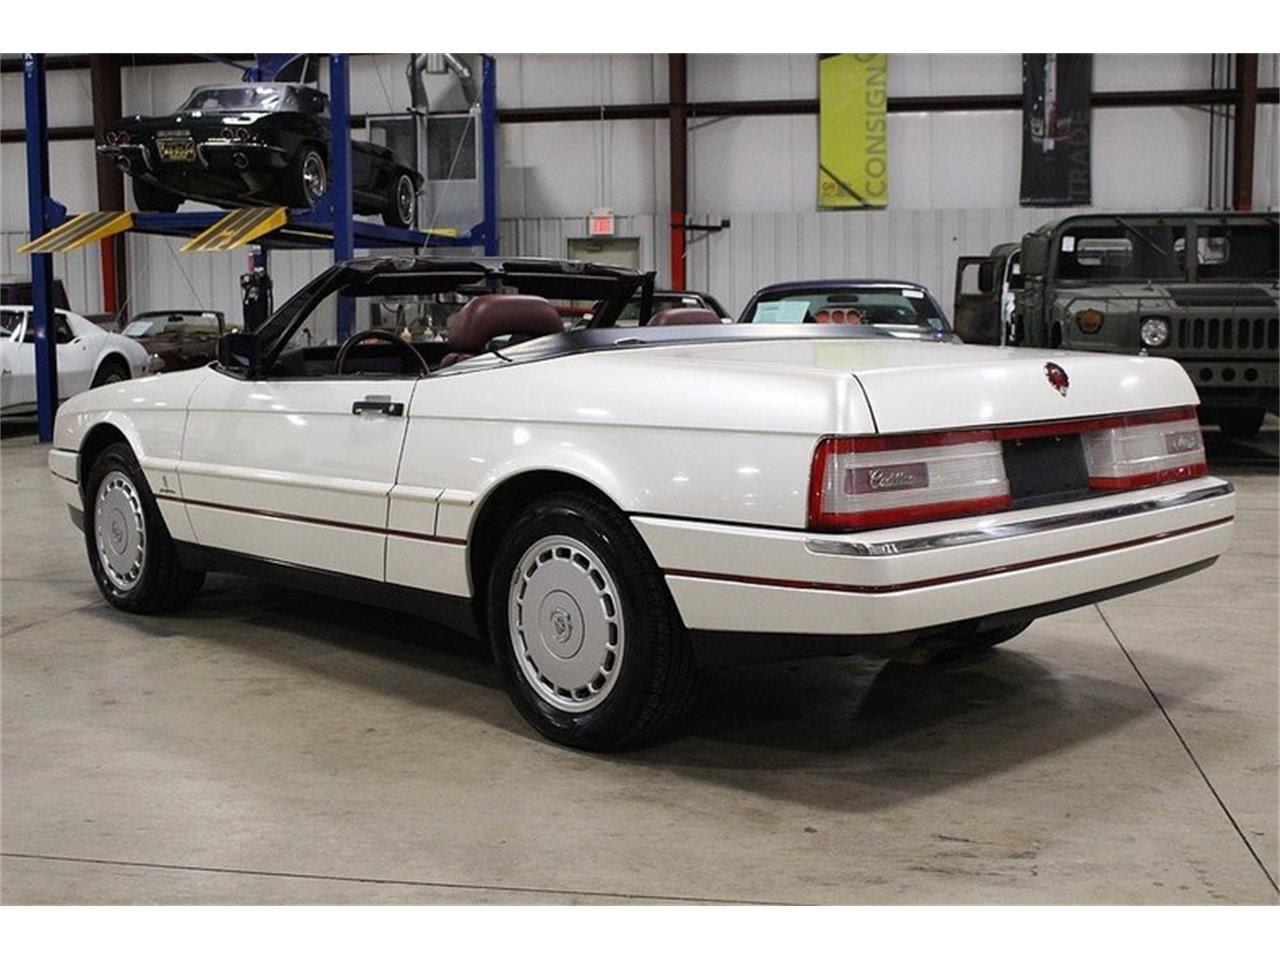 Cadillac Allante In Michigan For Sale Used Cars On ...